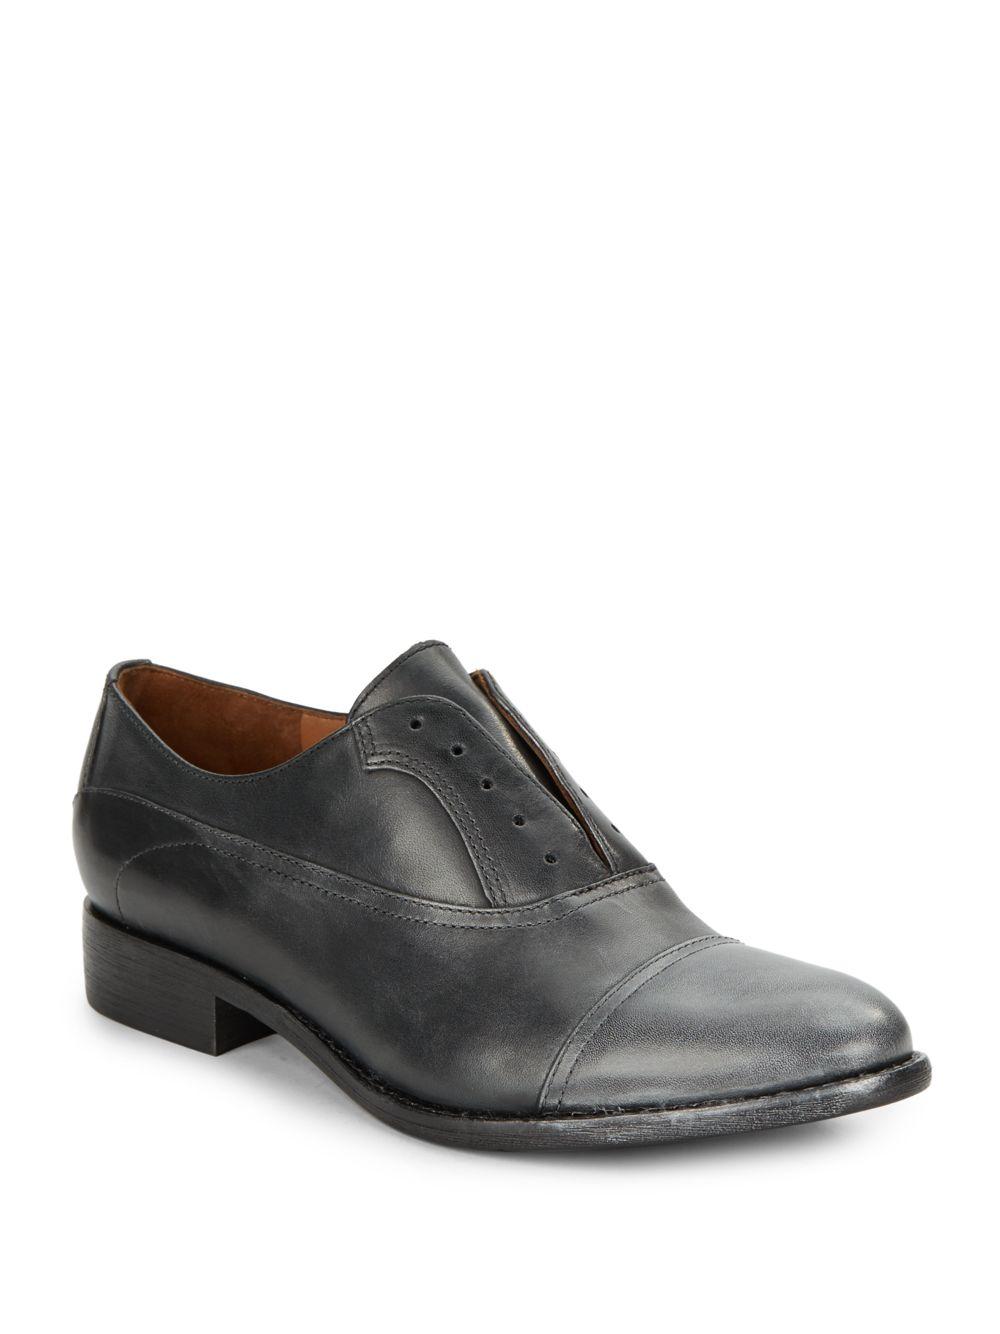 Simple Kenneth Cole Kenneth Cole Reaction Womenu0026#39;s Whole Some Ballet Flats Womenu0026#39;s Shoes | Shoes - Shop ...